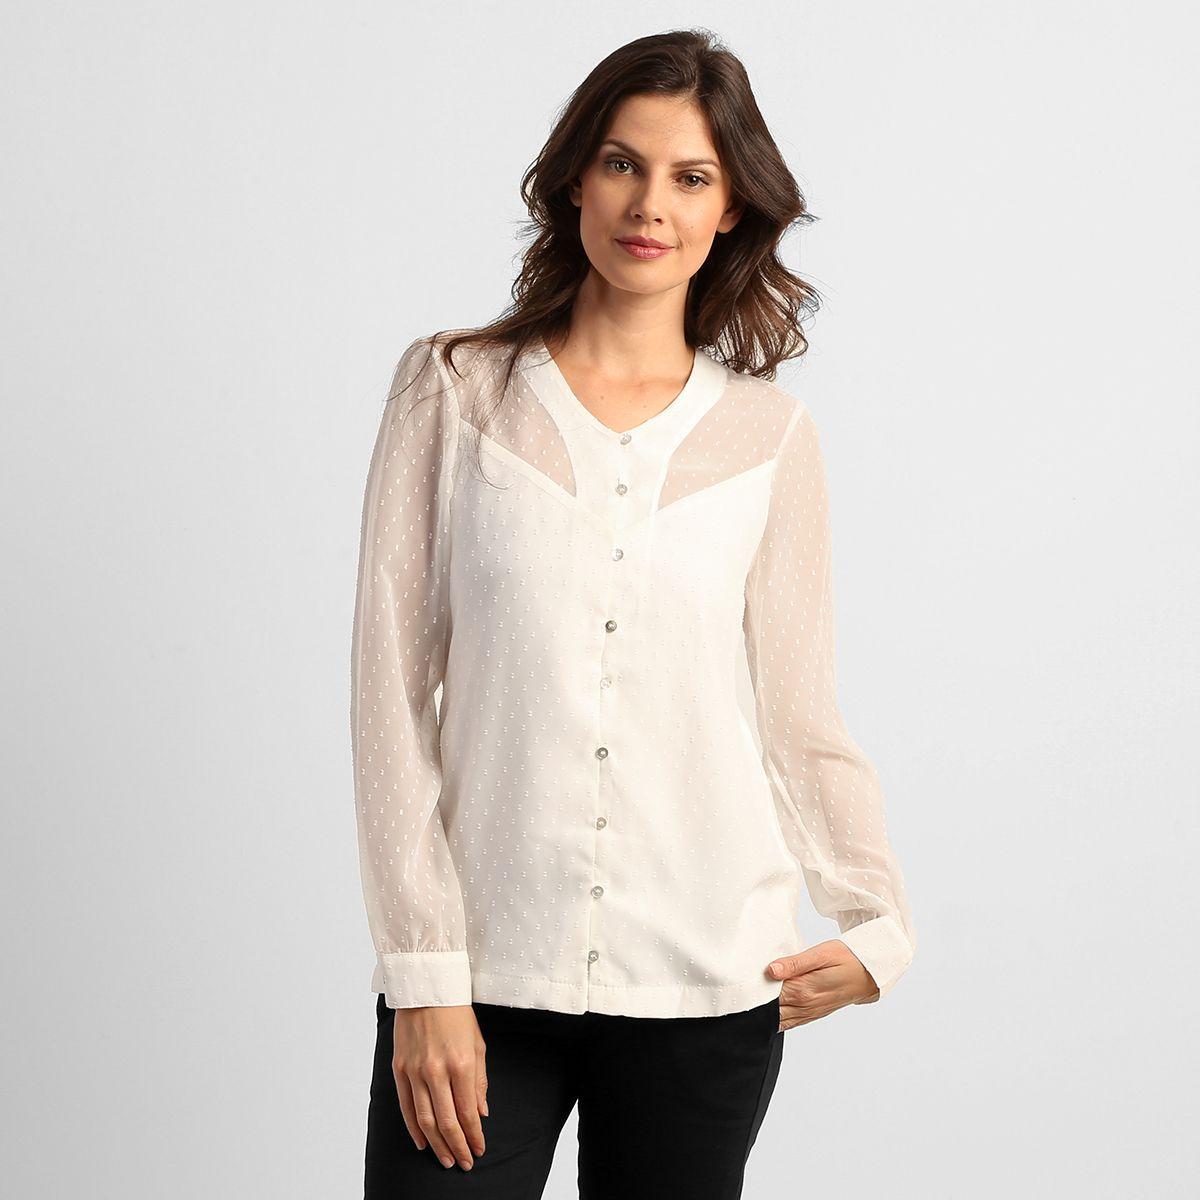 Camisa TVZ Transparente c/ Devore de Seda Off White | Zattini